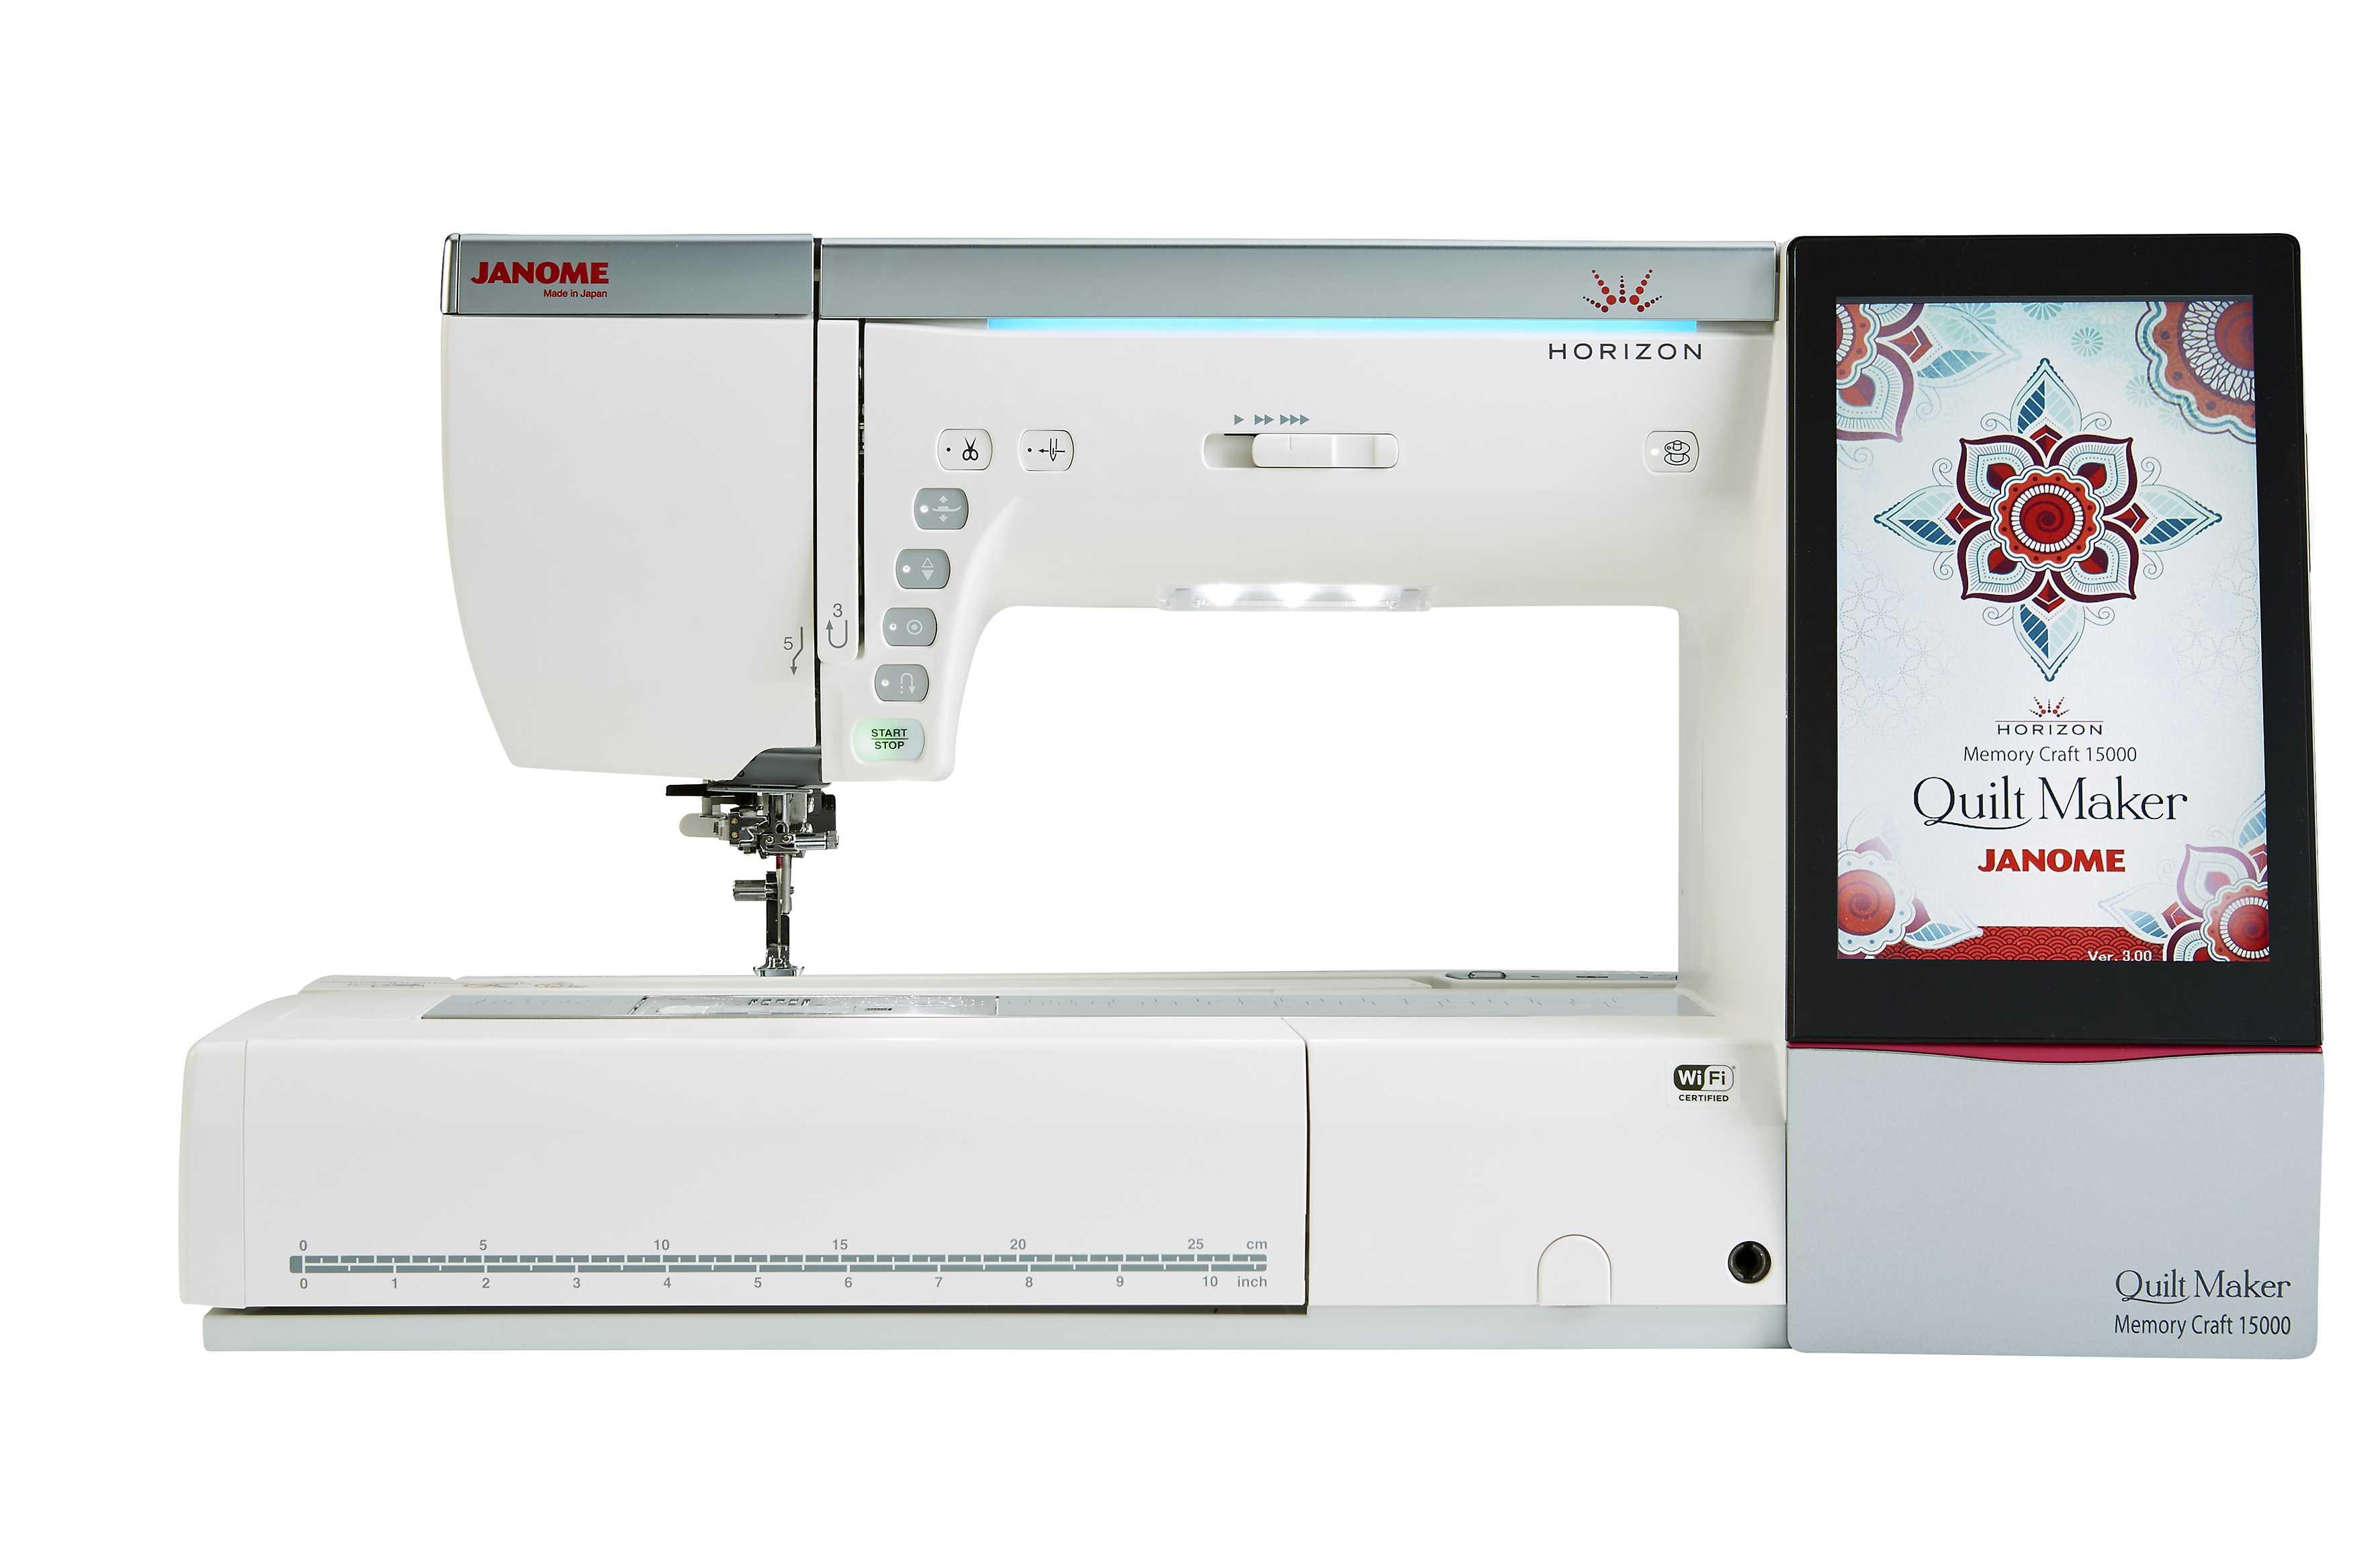 Janome Horizon Memory Craft 15000 With Quilt Maker Upgrade